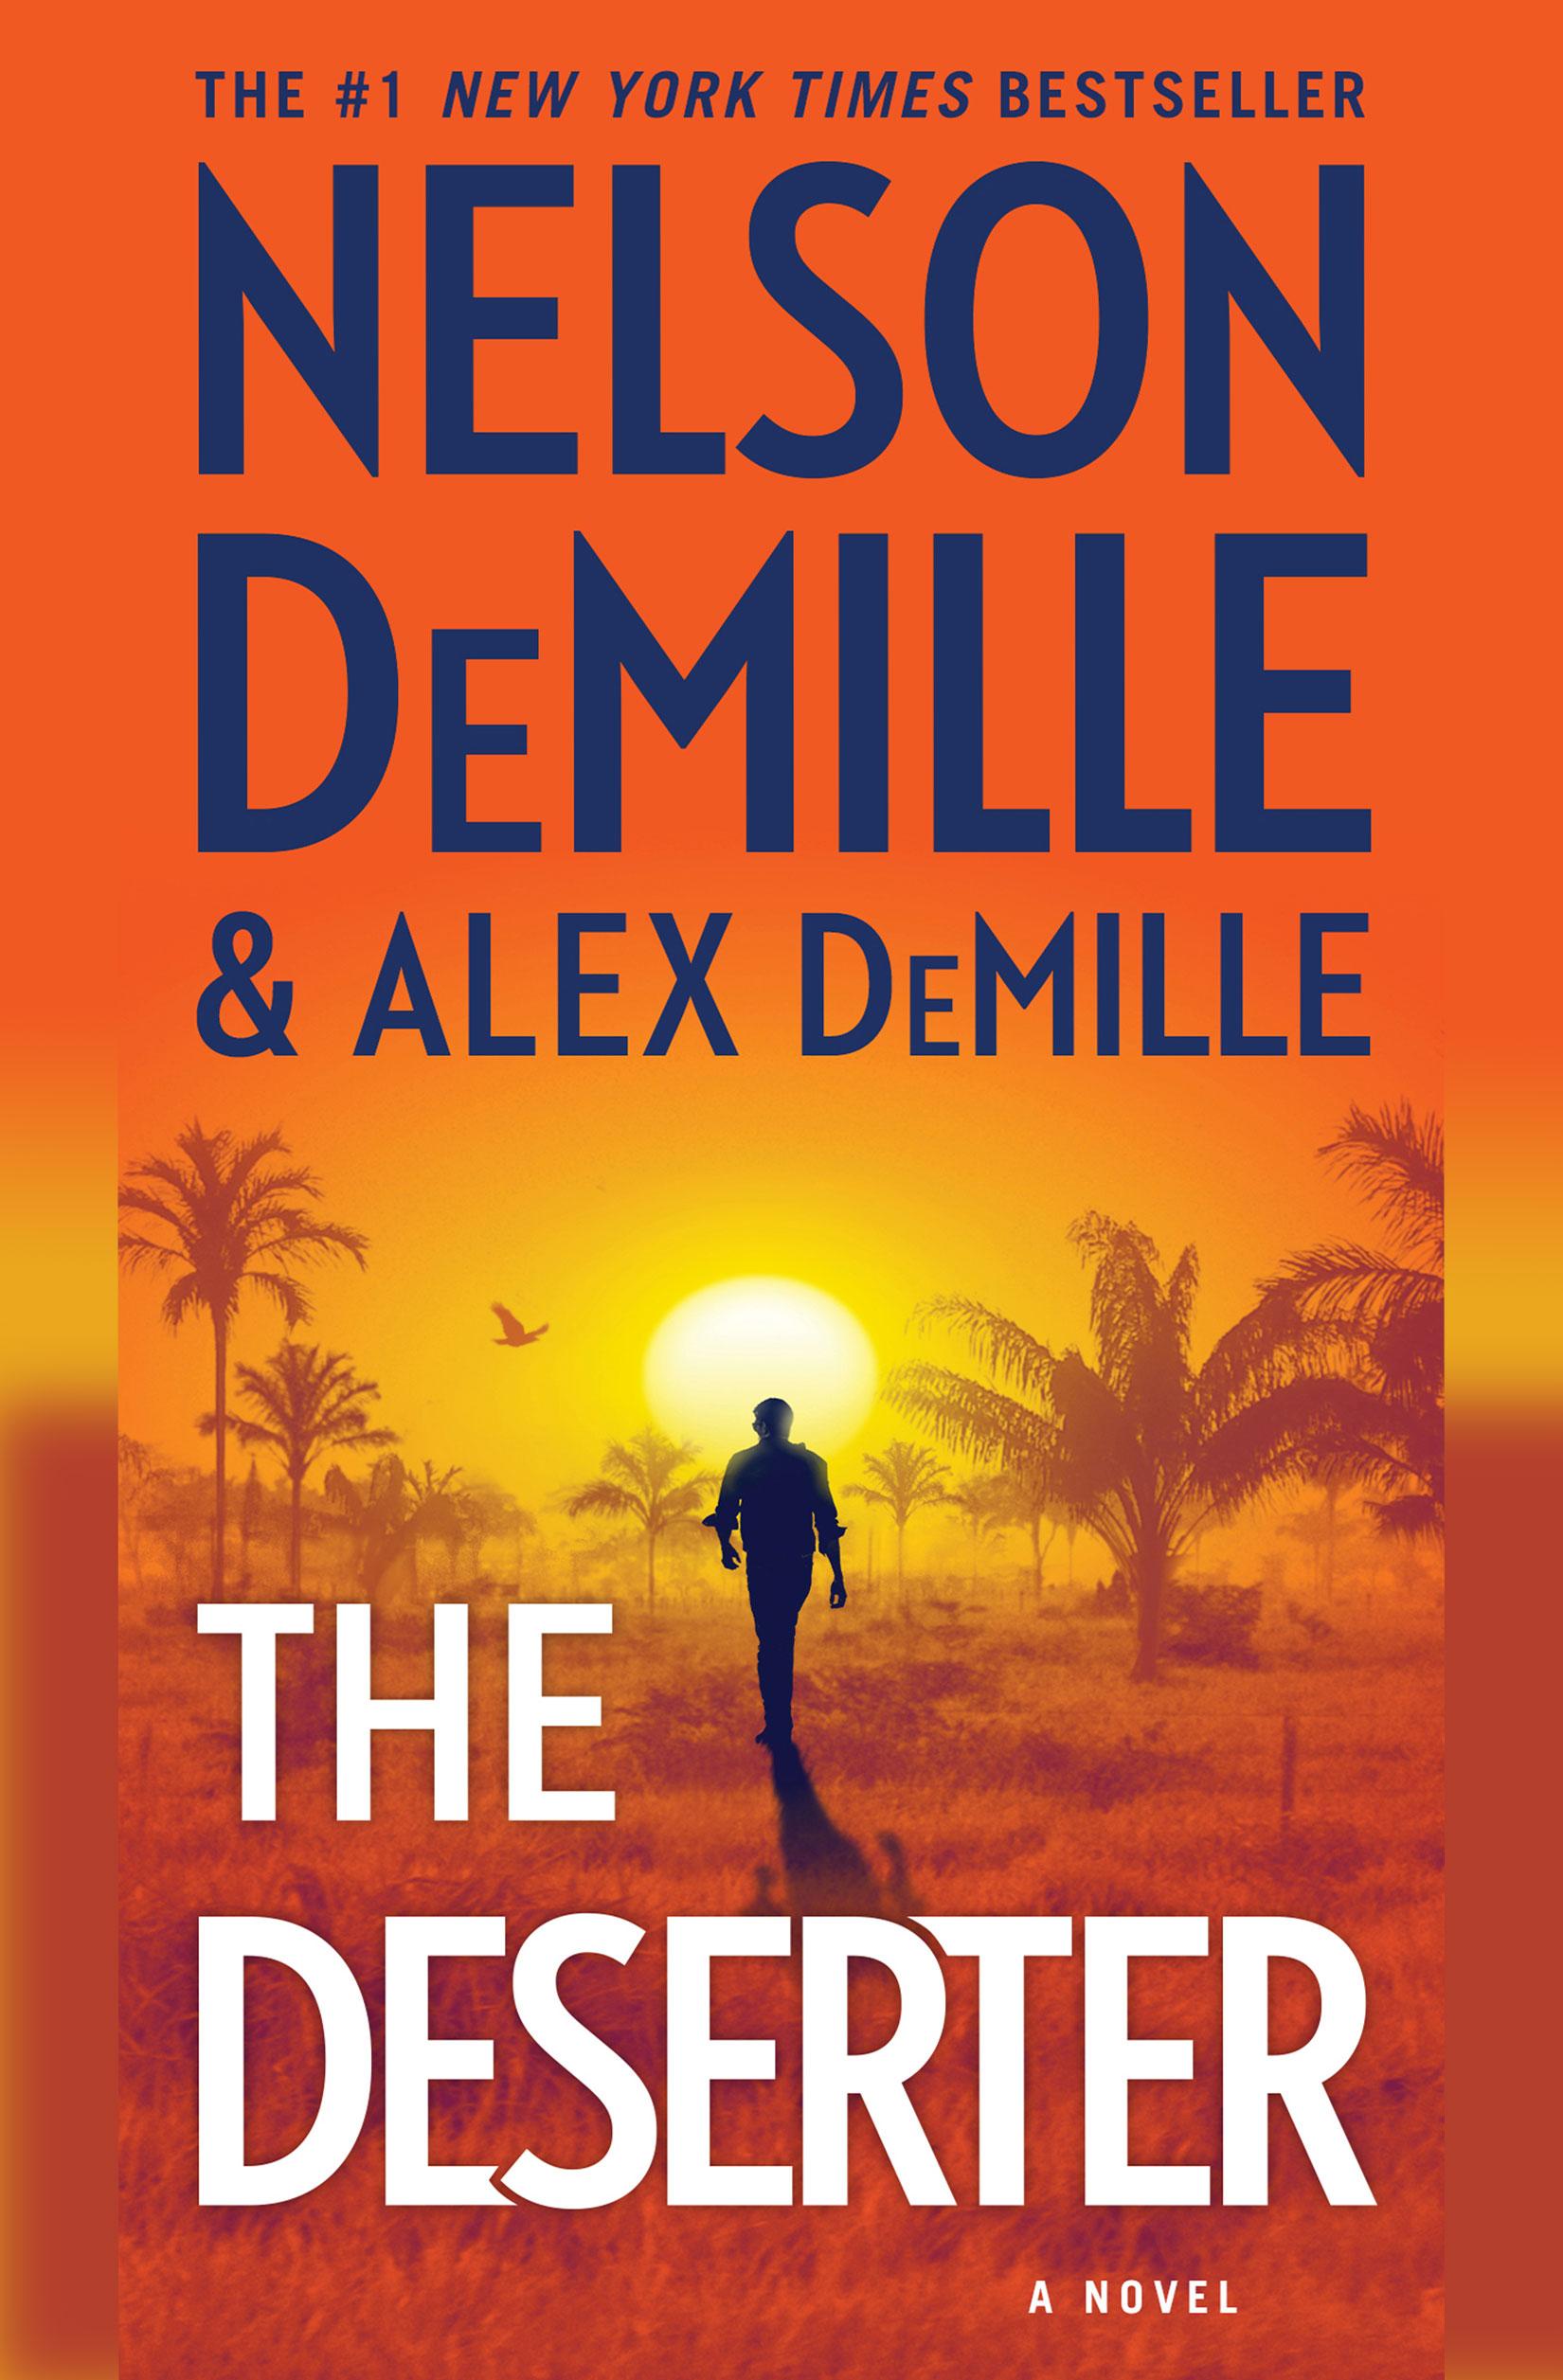 Nelson DeMille & Alex DeMeille The Deserter Book Cover